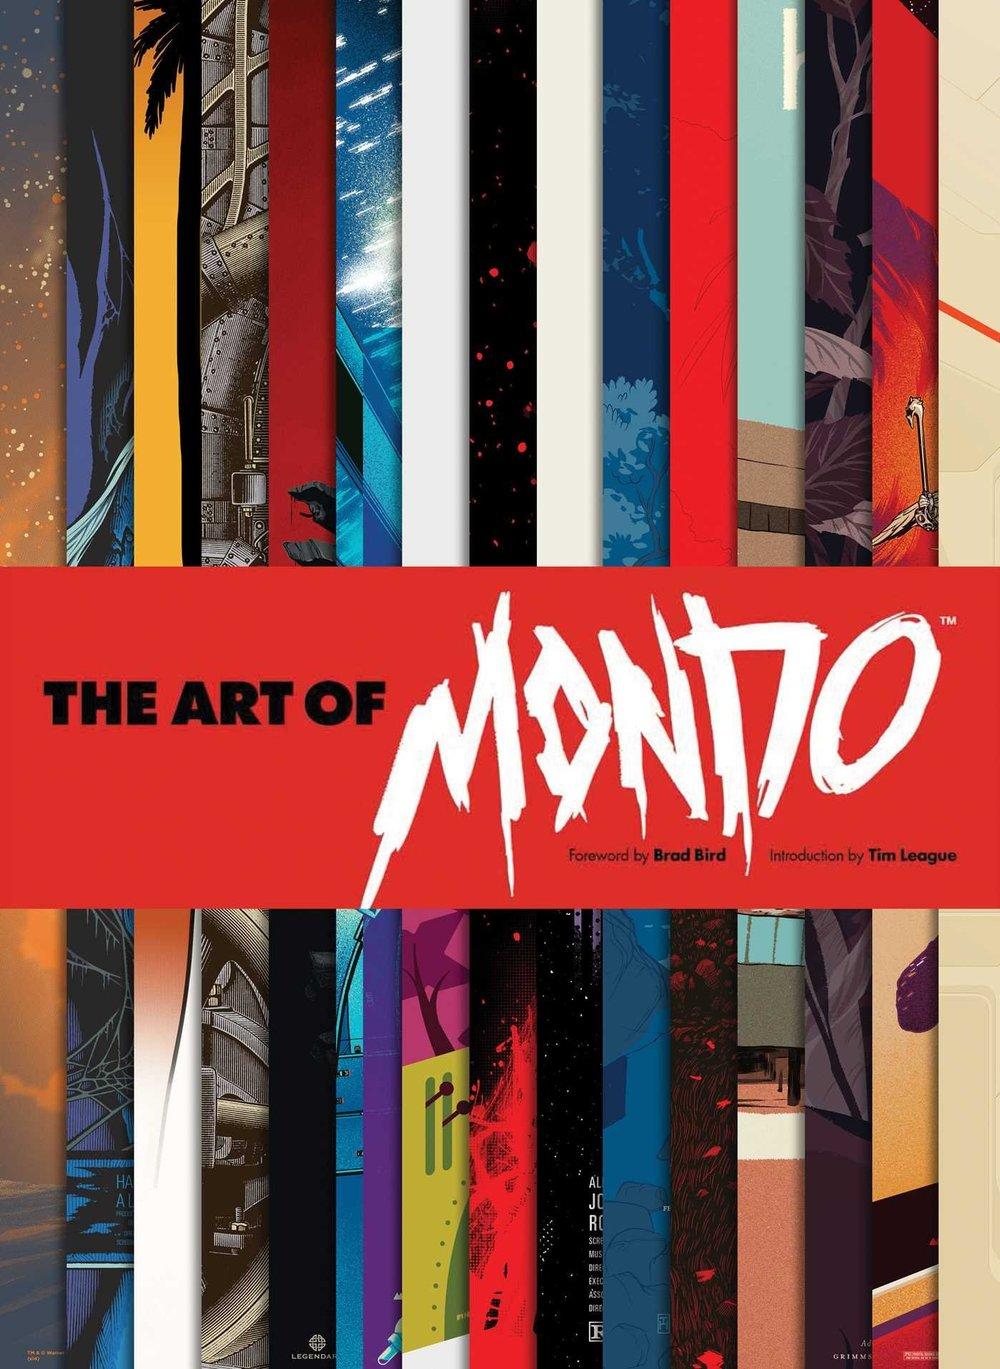 The Art of Mondo book cover.jpg